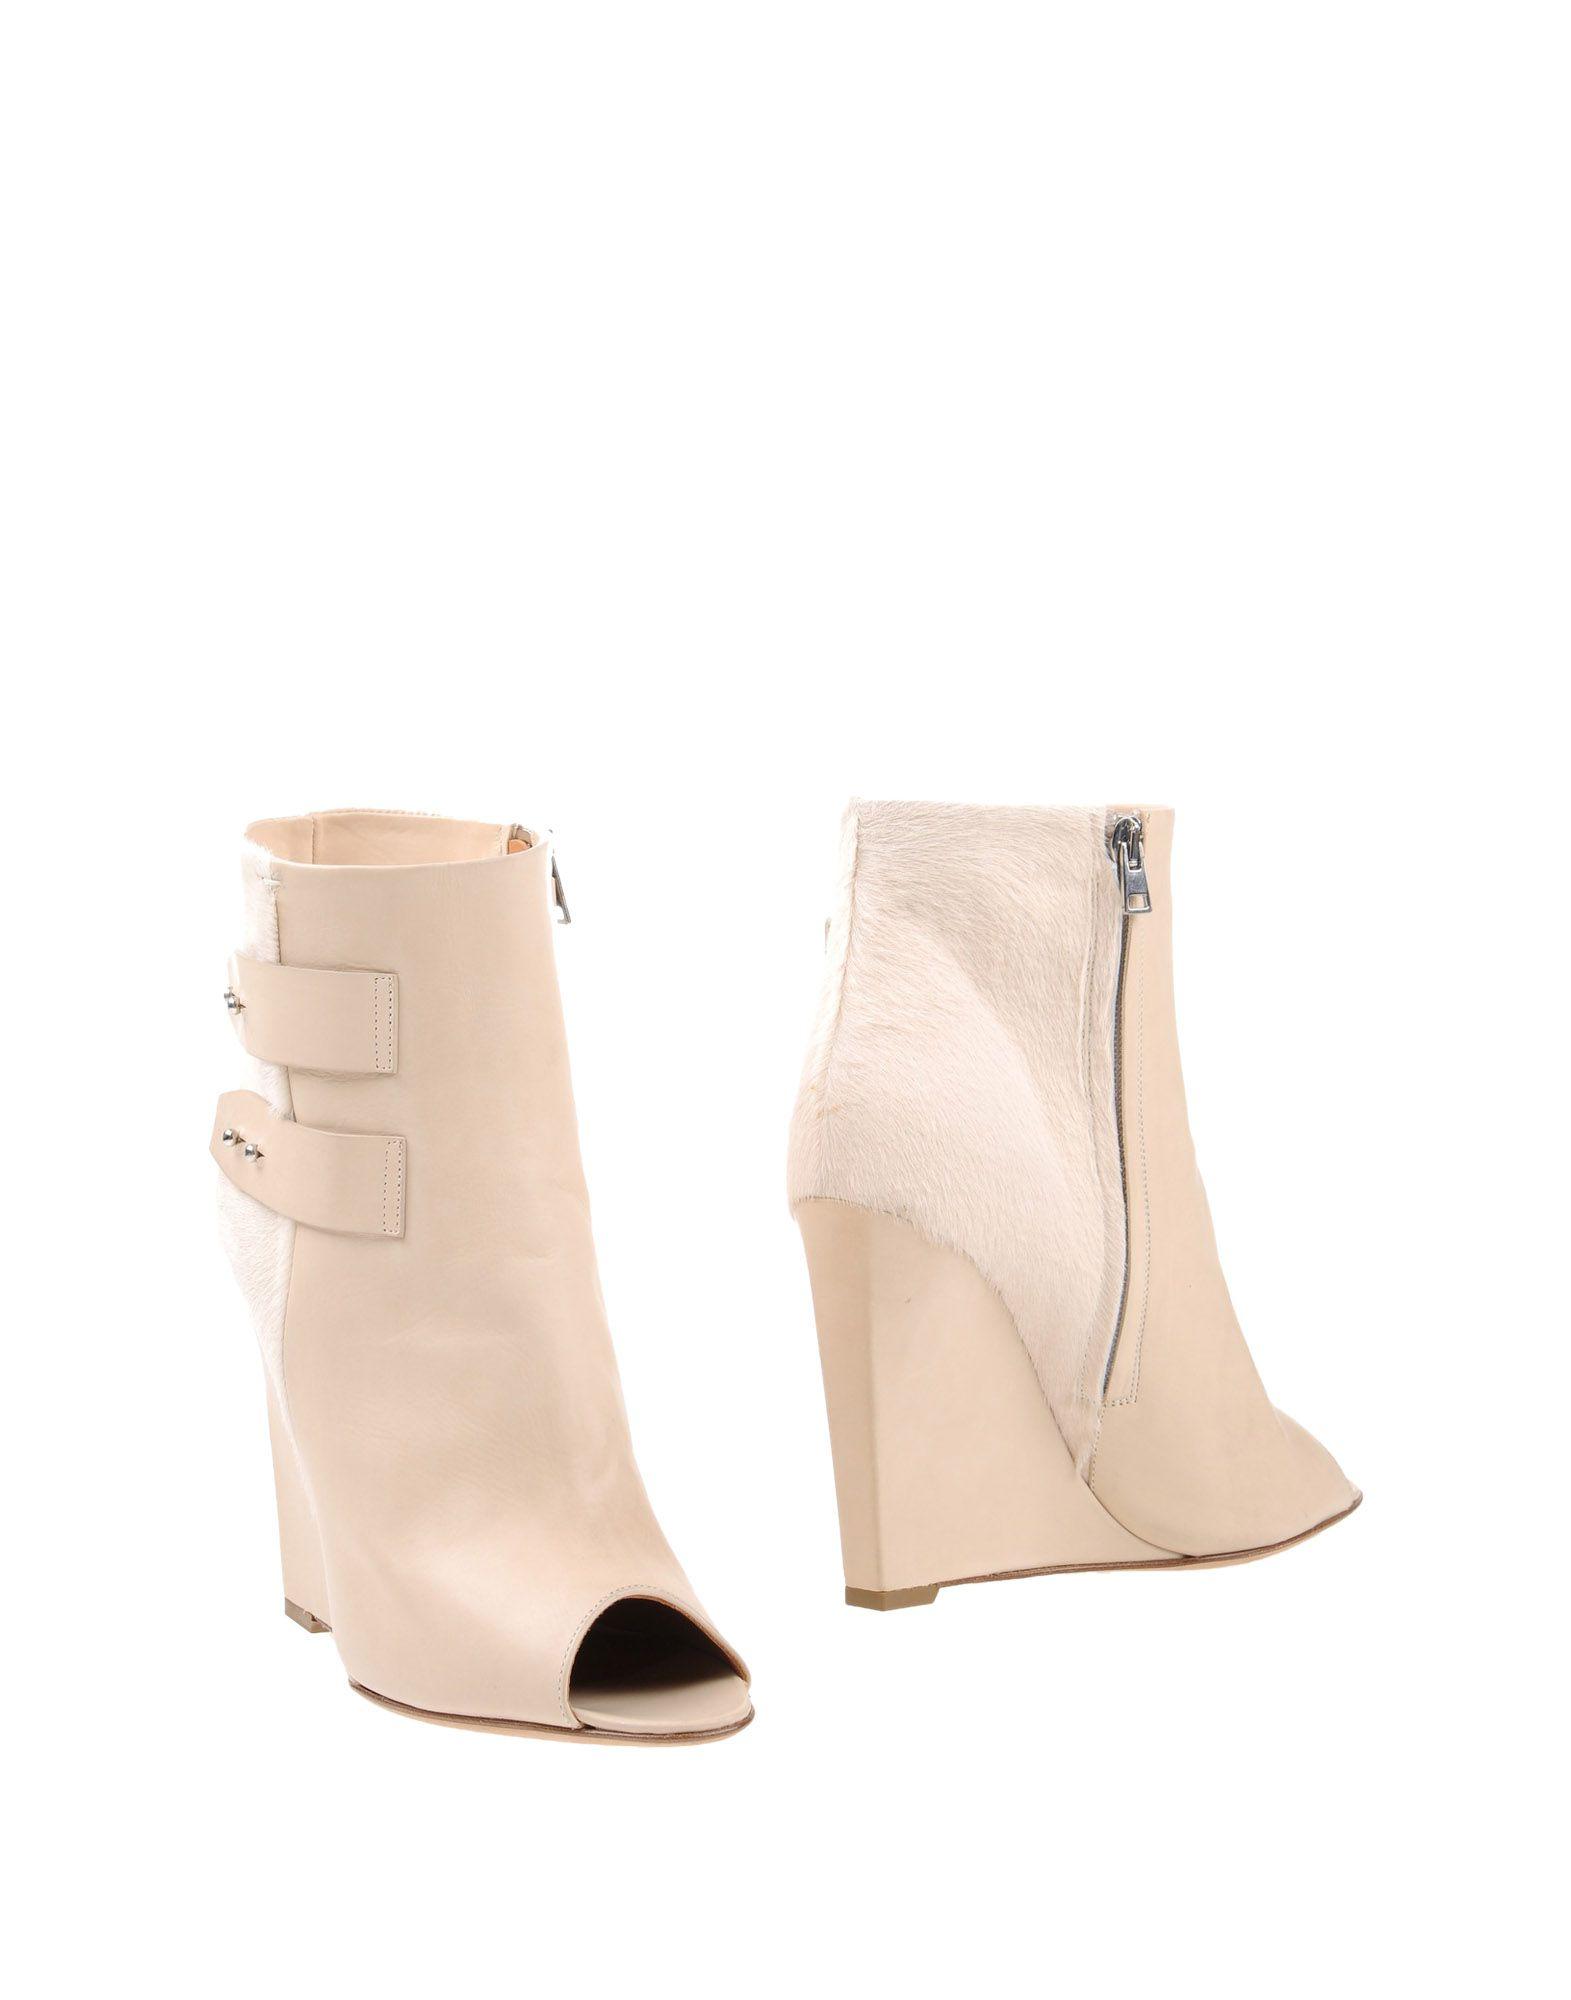 Kallistè Stiefelette Damen  11360118MC Gute Qualität beliebte Schuhe